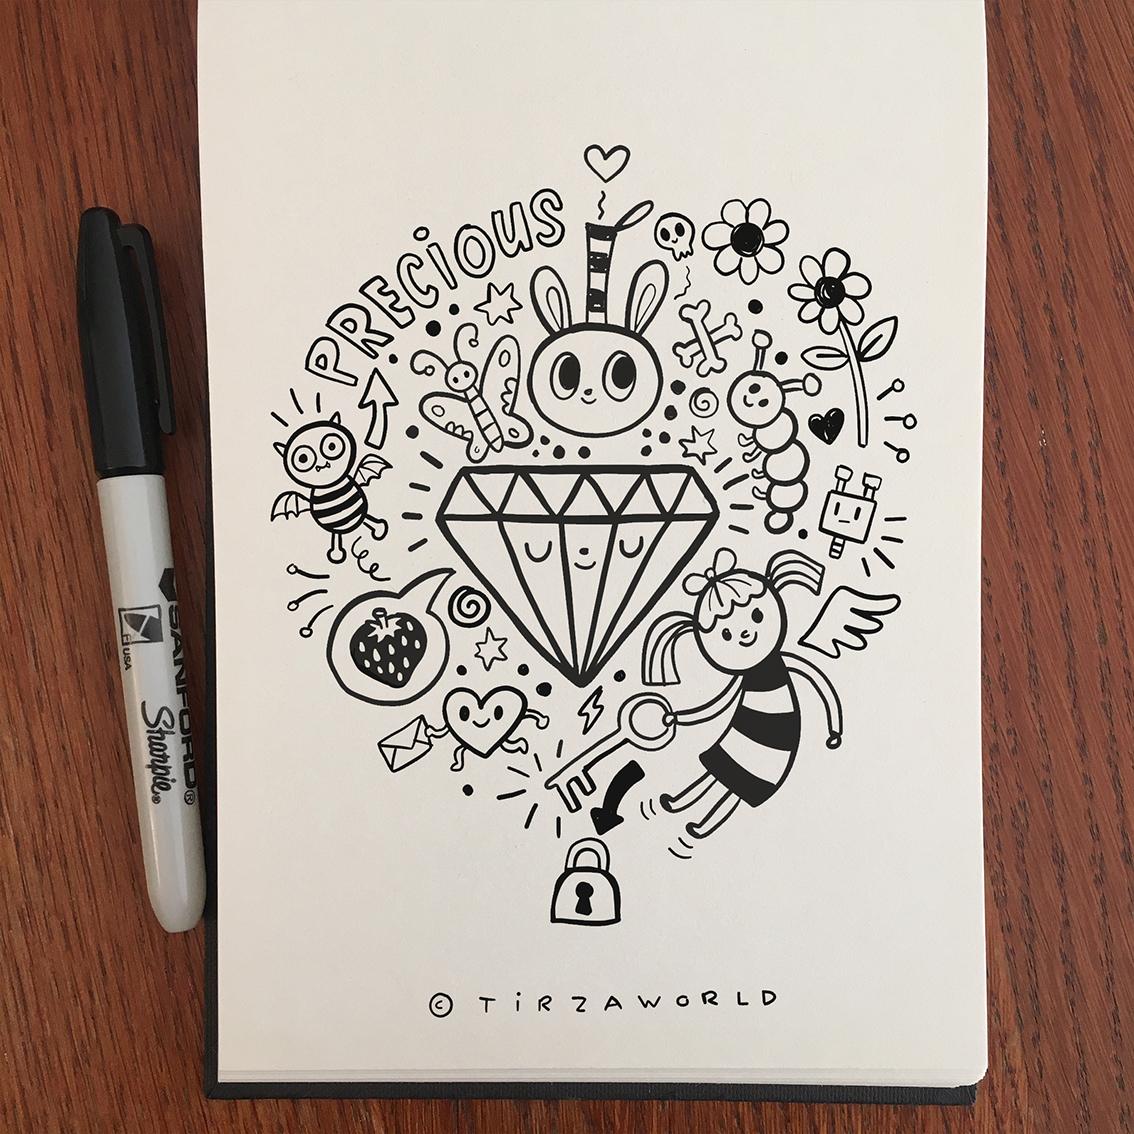 Tirzaworld doodle art